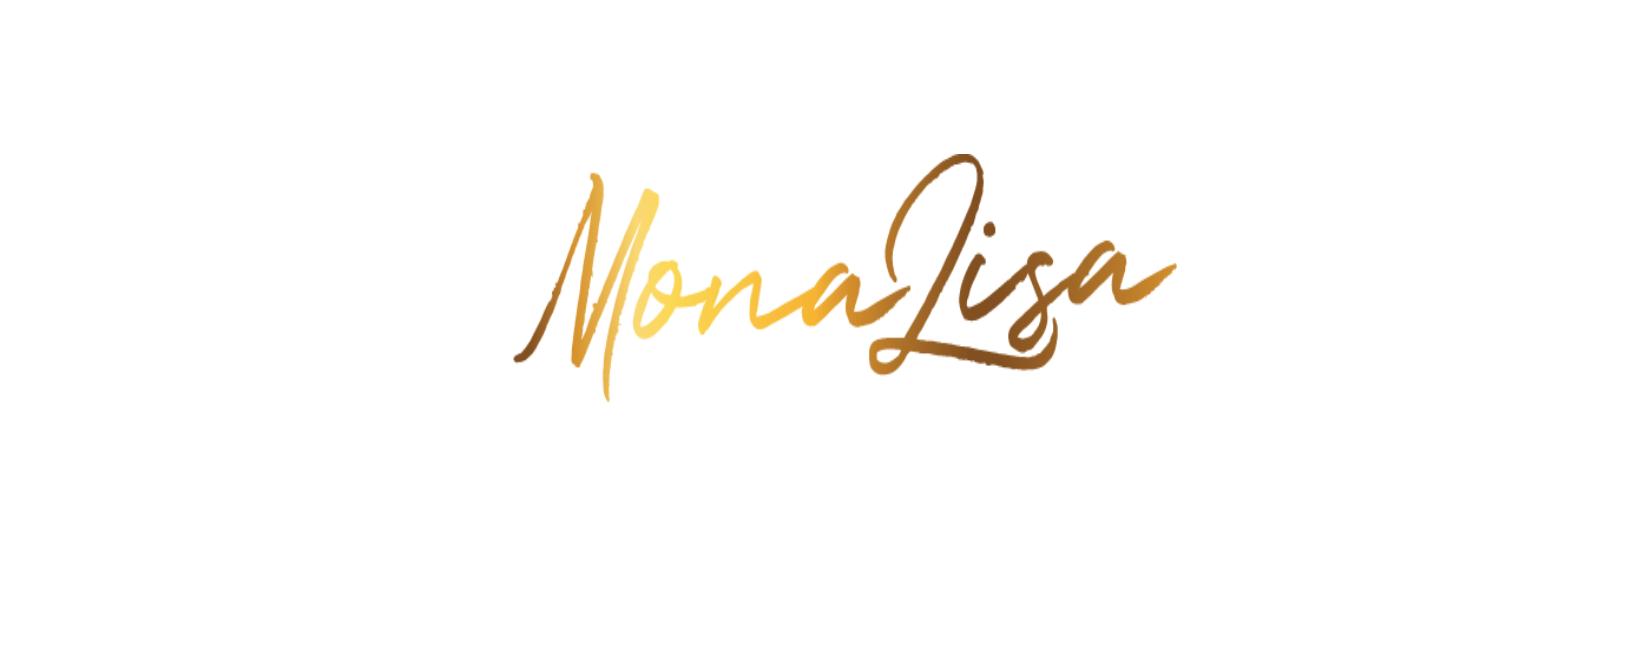 MonaLisa Healing Discount Code 2021